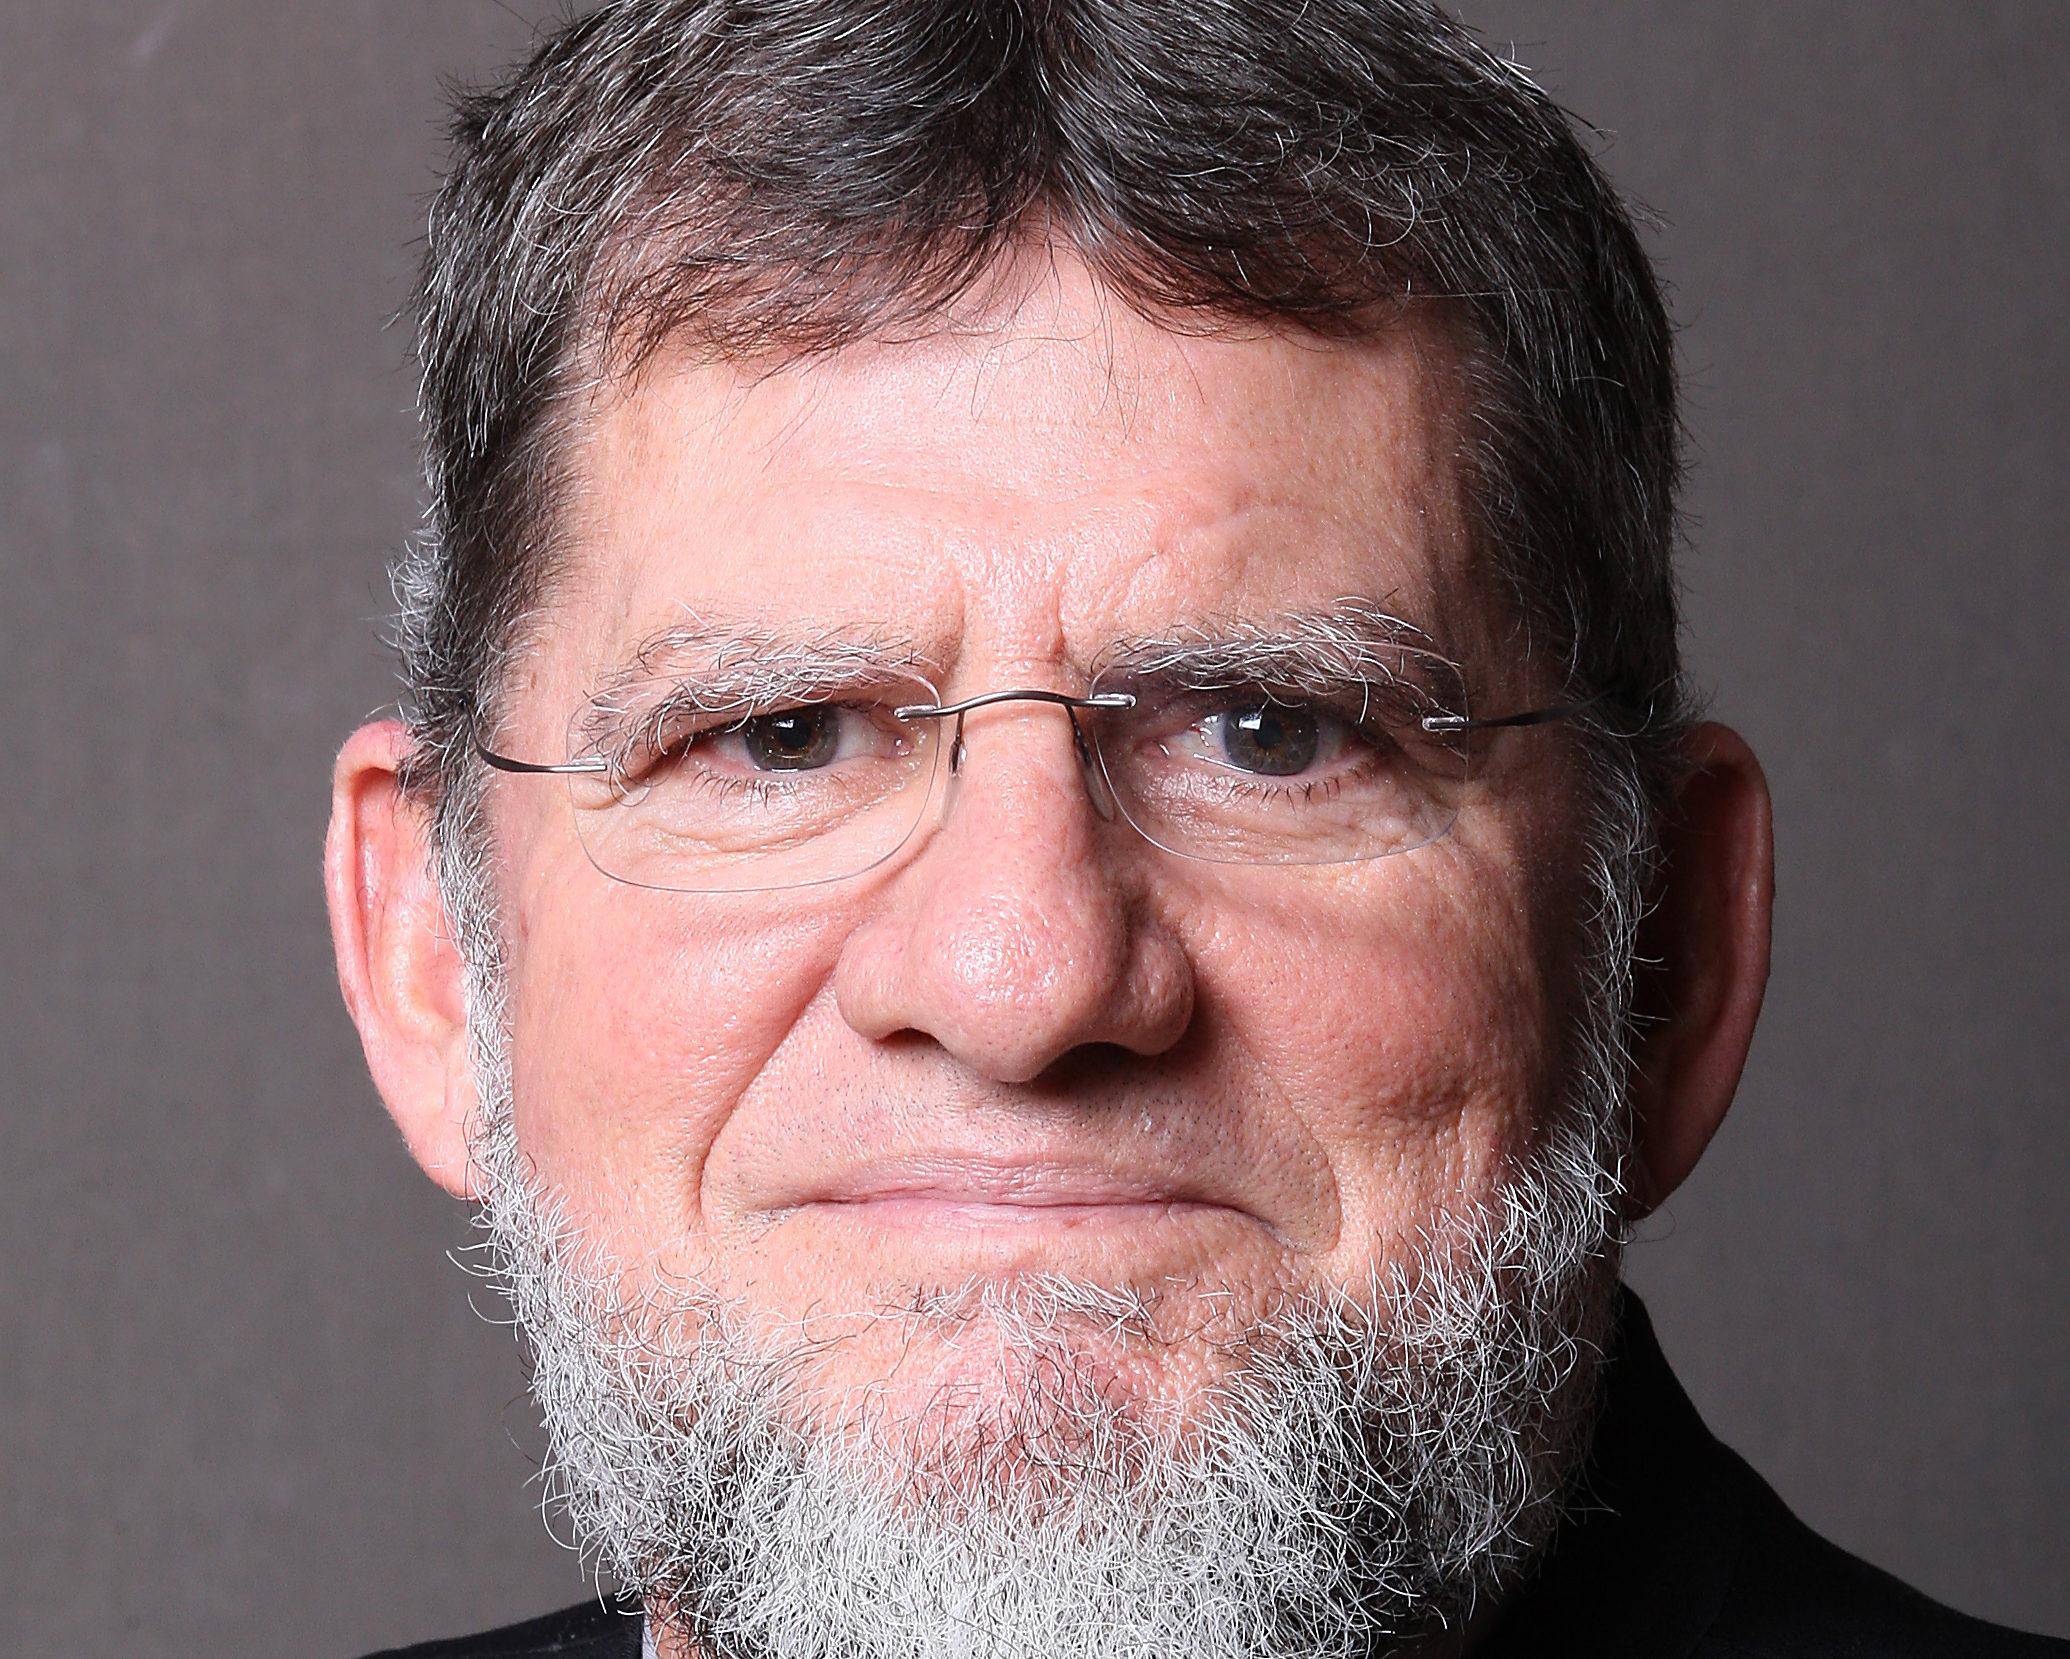 Levi Huffman